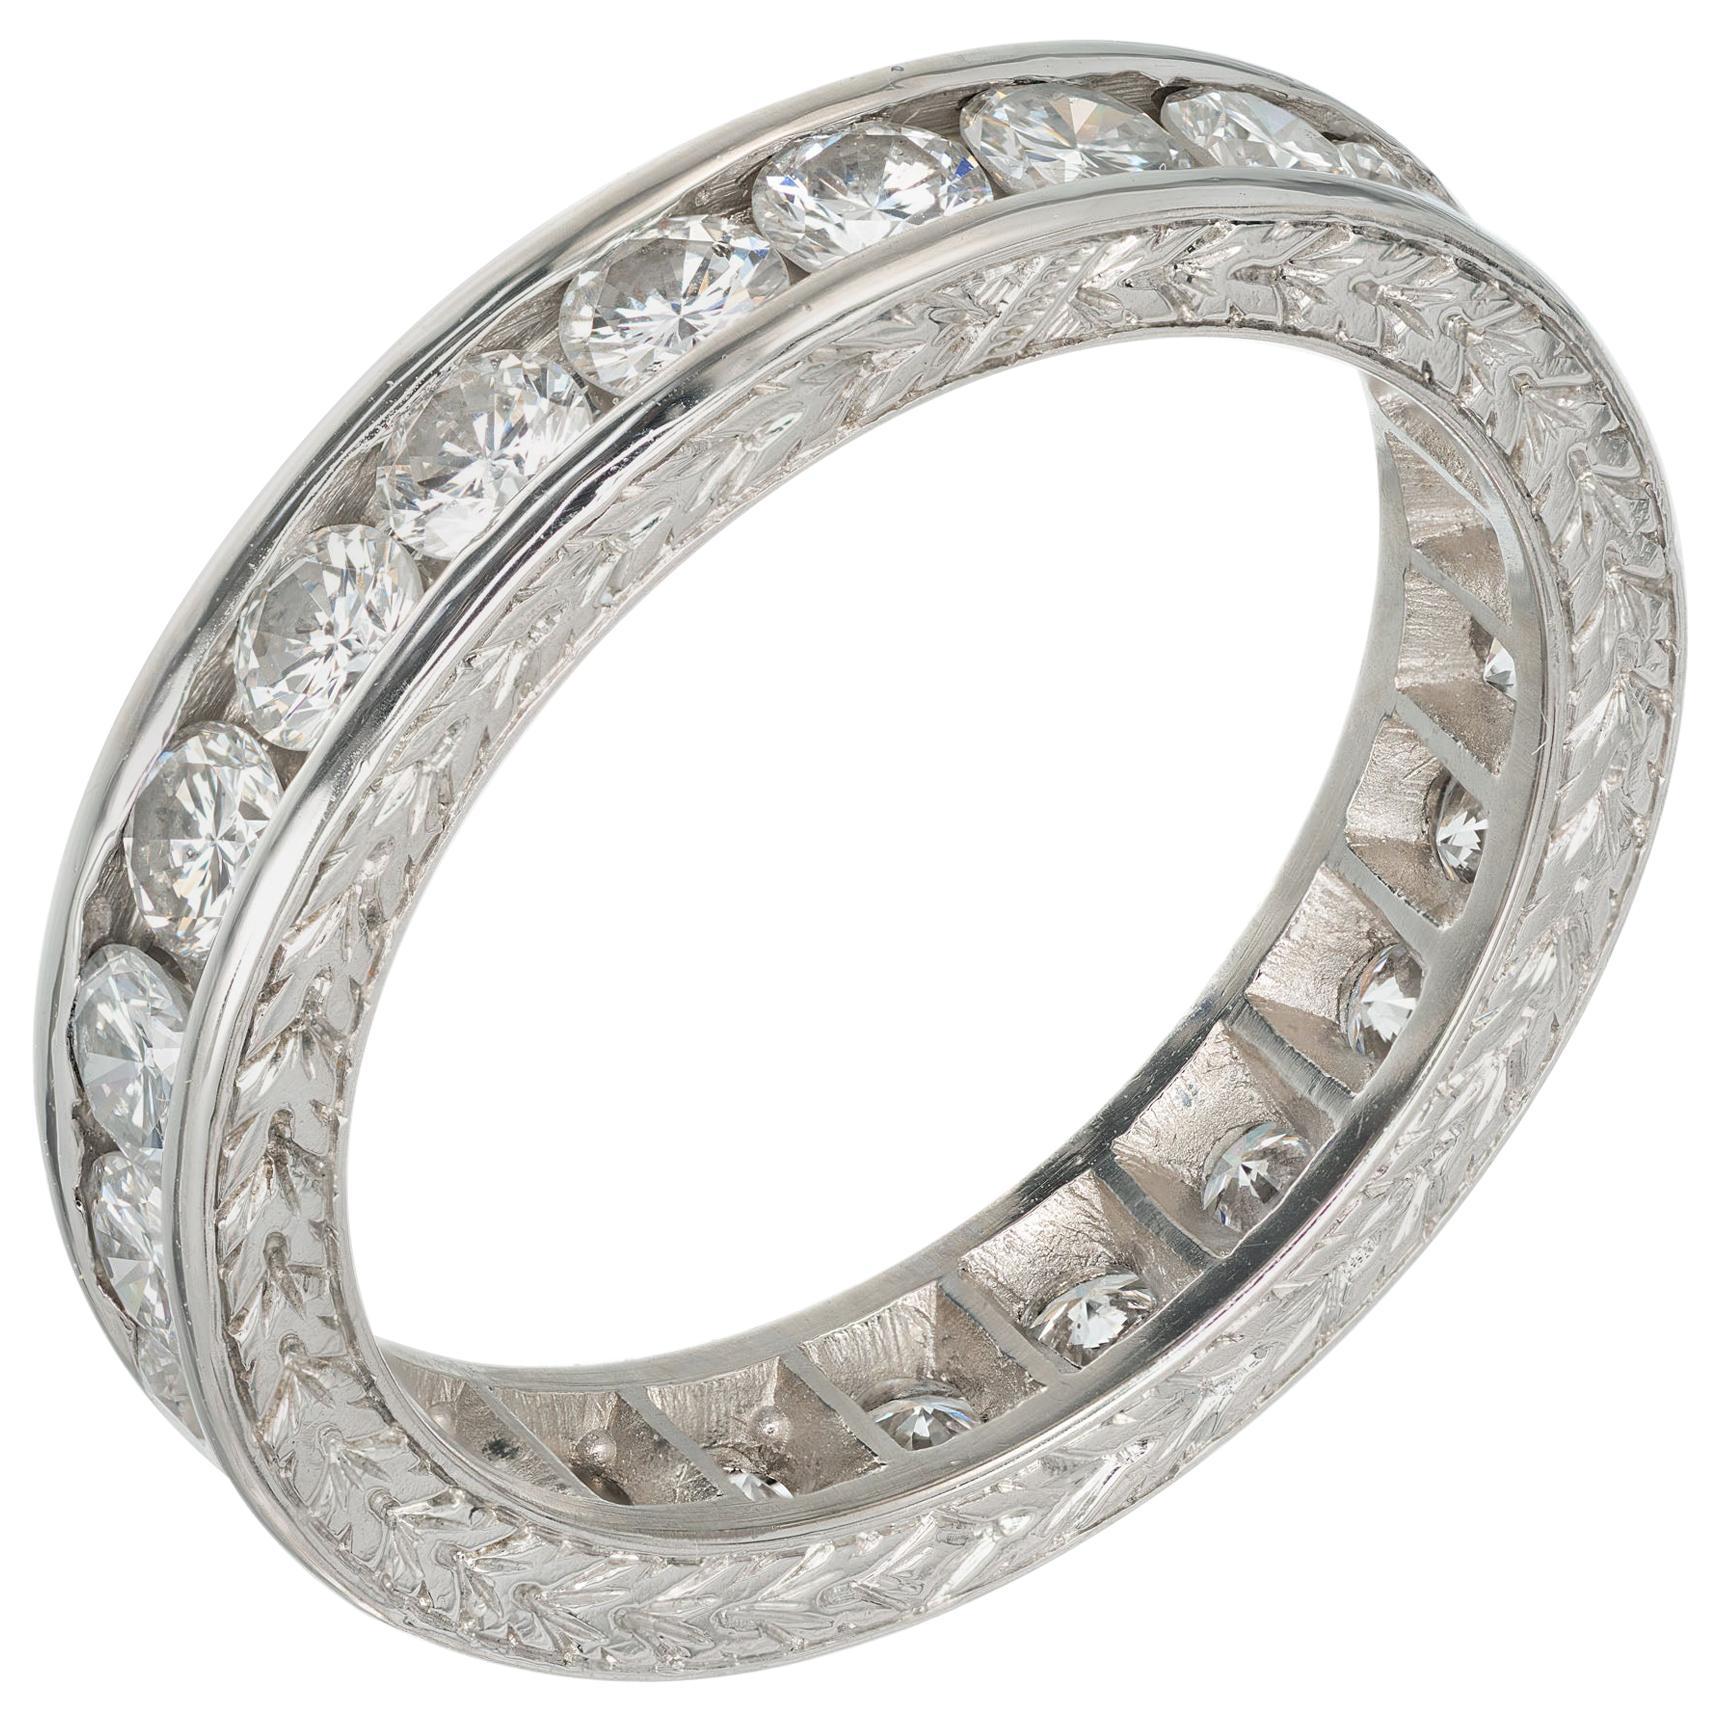 Peter Suchy 1.55 Carat Diamond Platinum Eternity Wedding Band Ring